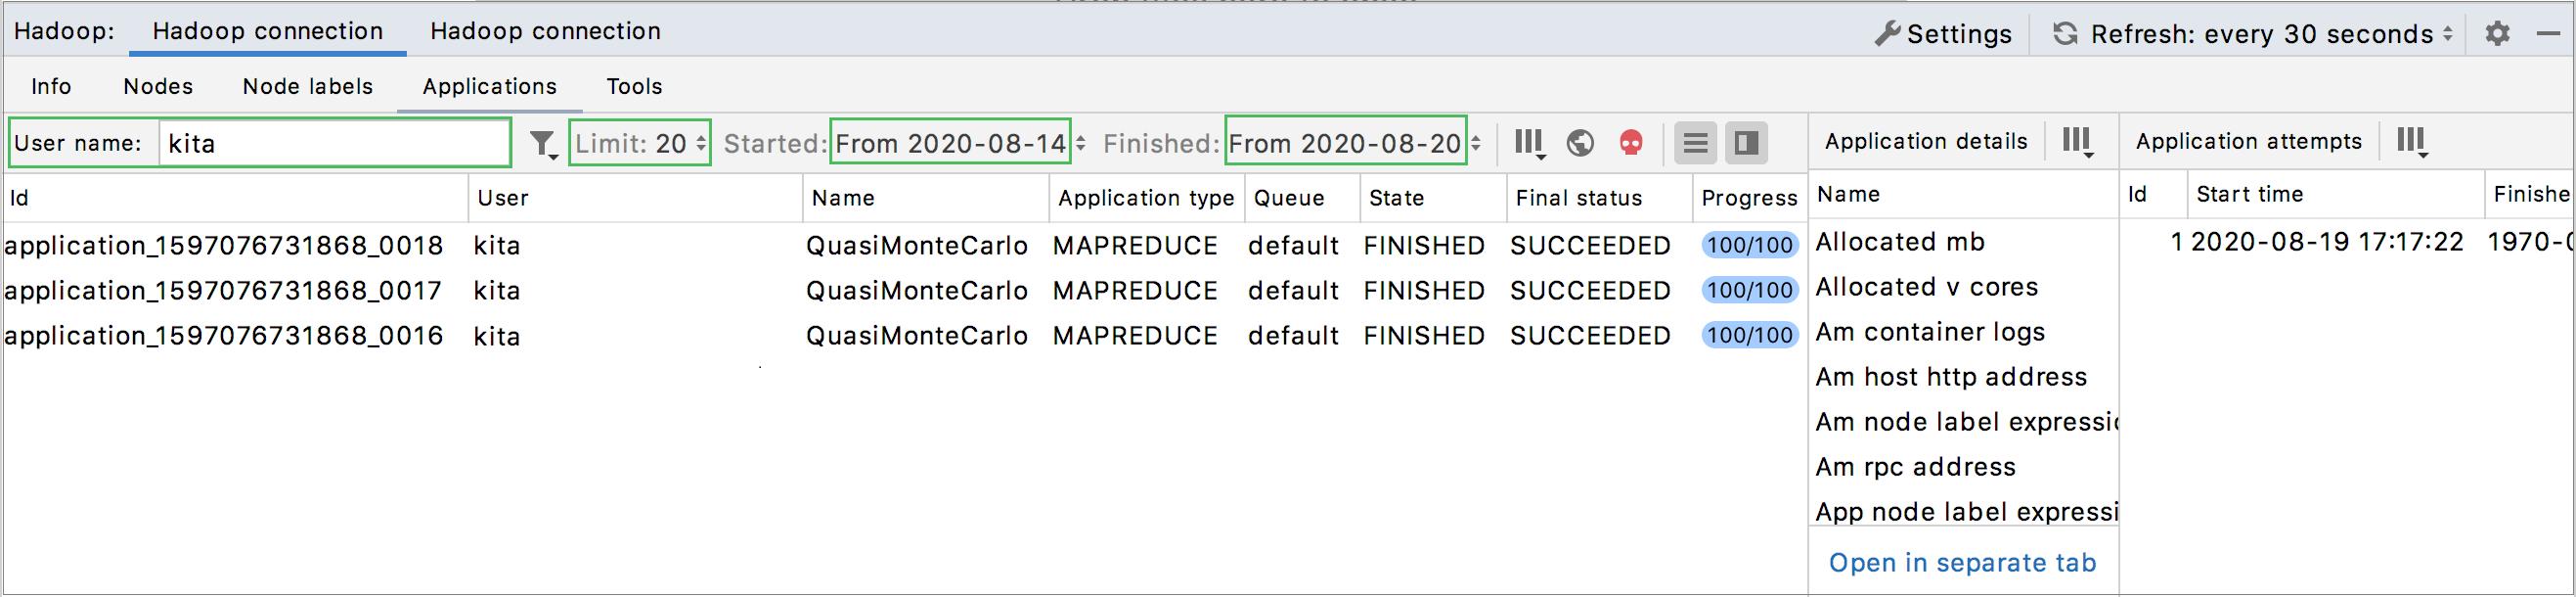 Hadoop monitoring: Applications